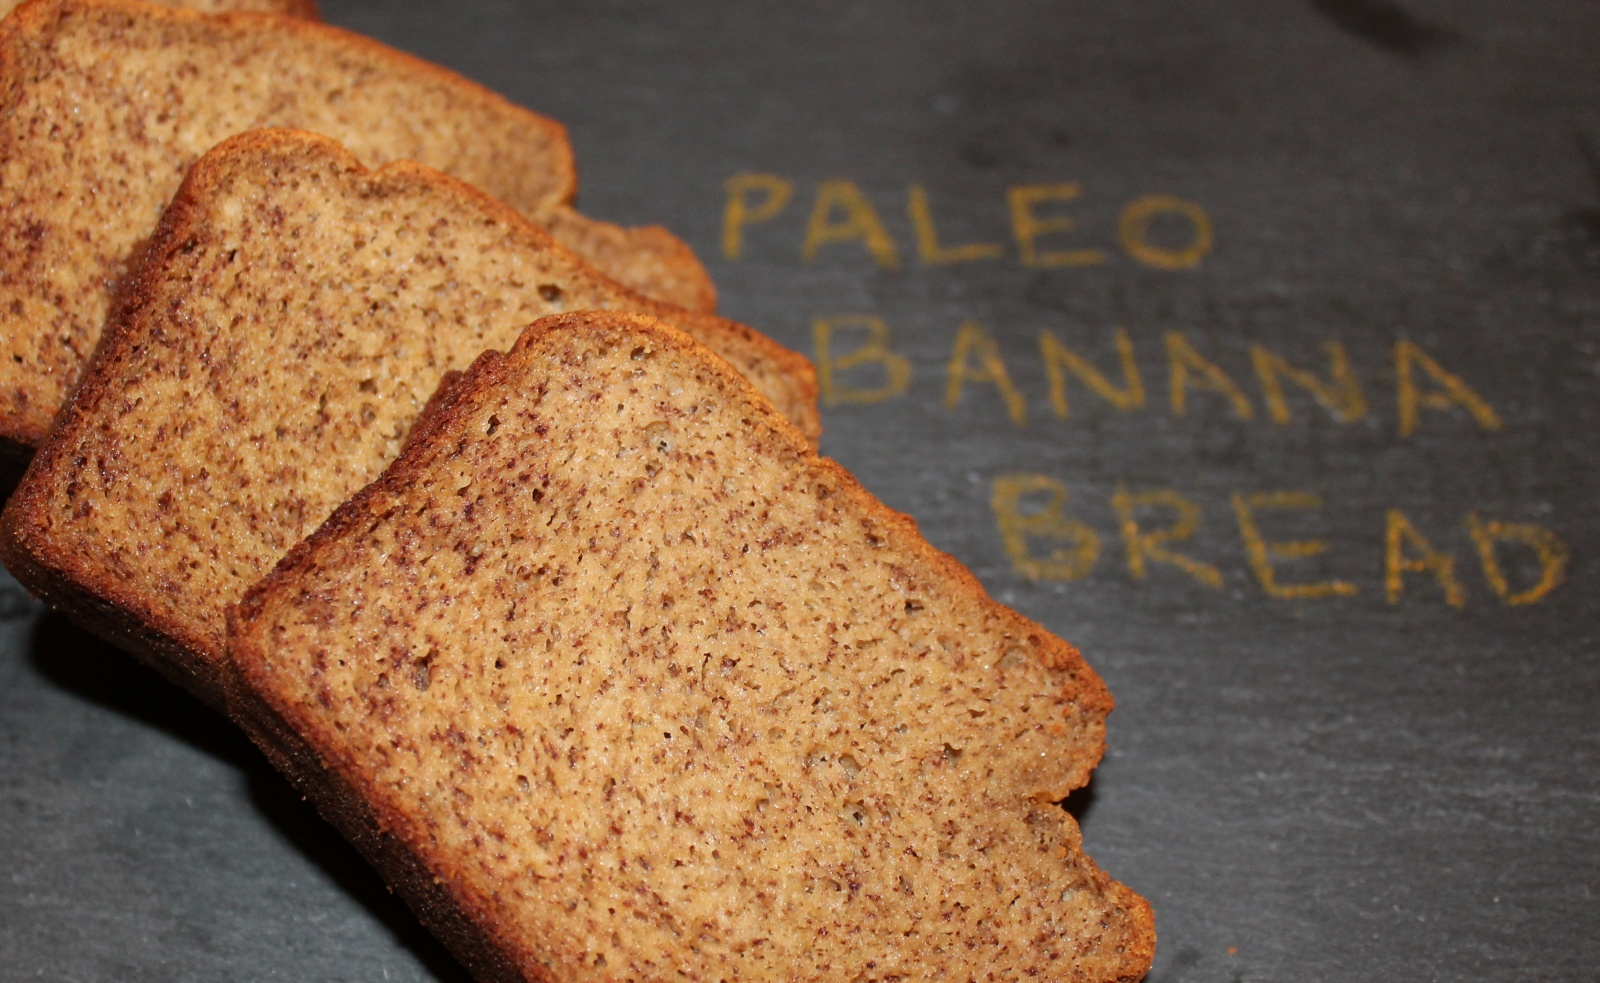 Paleo Banana Bread (sweetener-free)